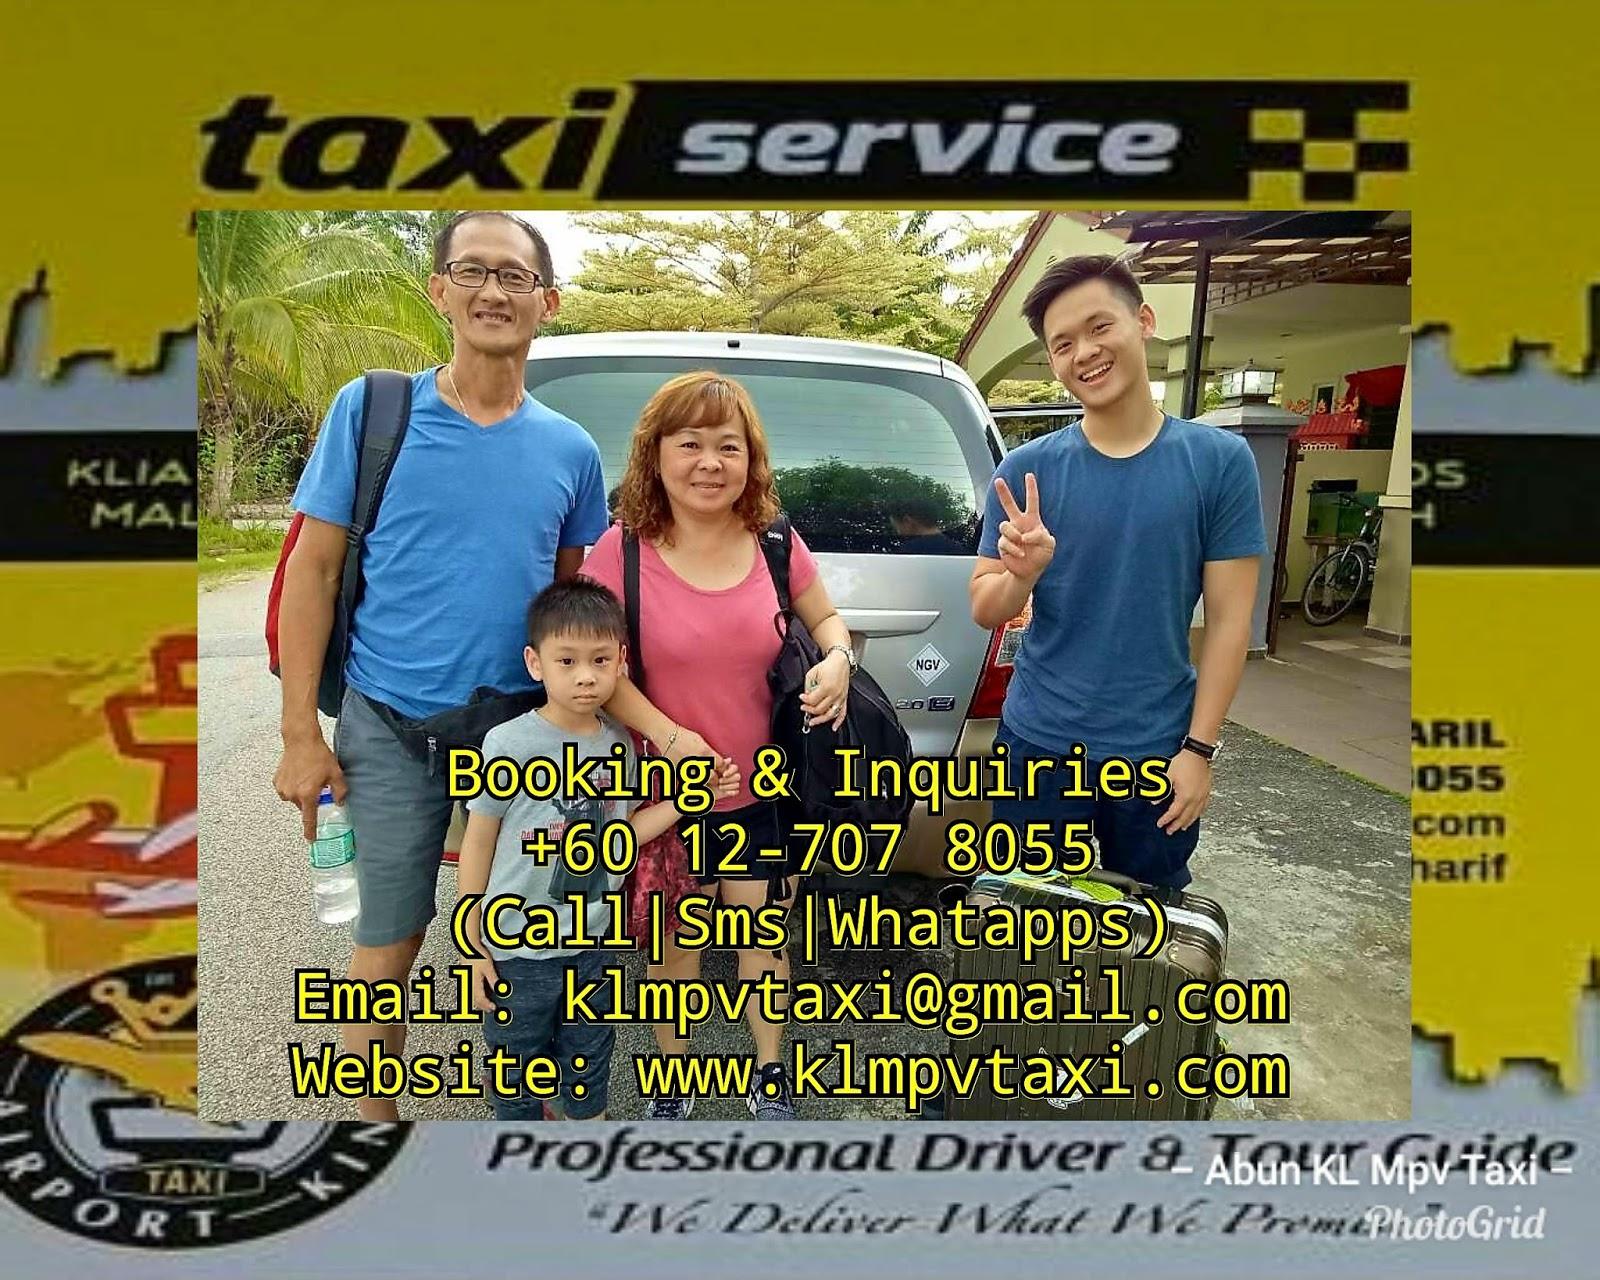 24 Hours Taxi Service Kl Mpv Taxi Airportking Airport Transfer Tour Sightseeing From Klia2 Airport Totaman Gemilang Sungkai Bidor Perak